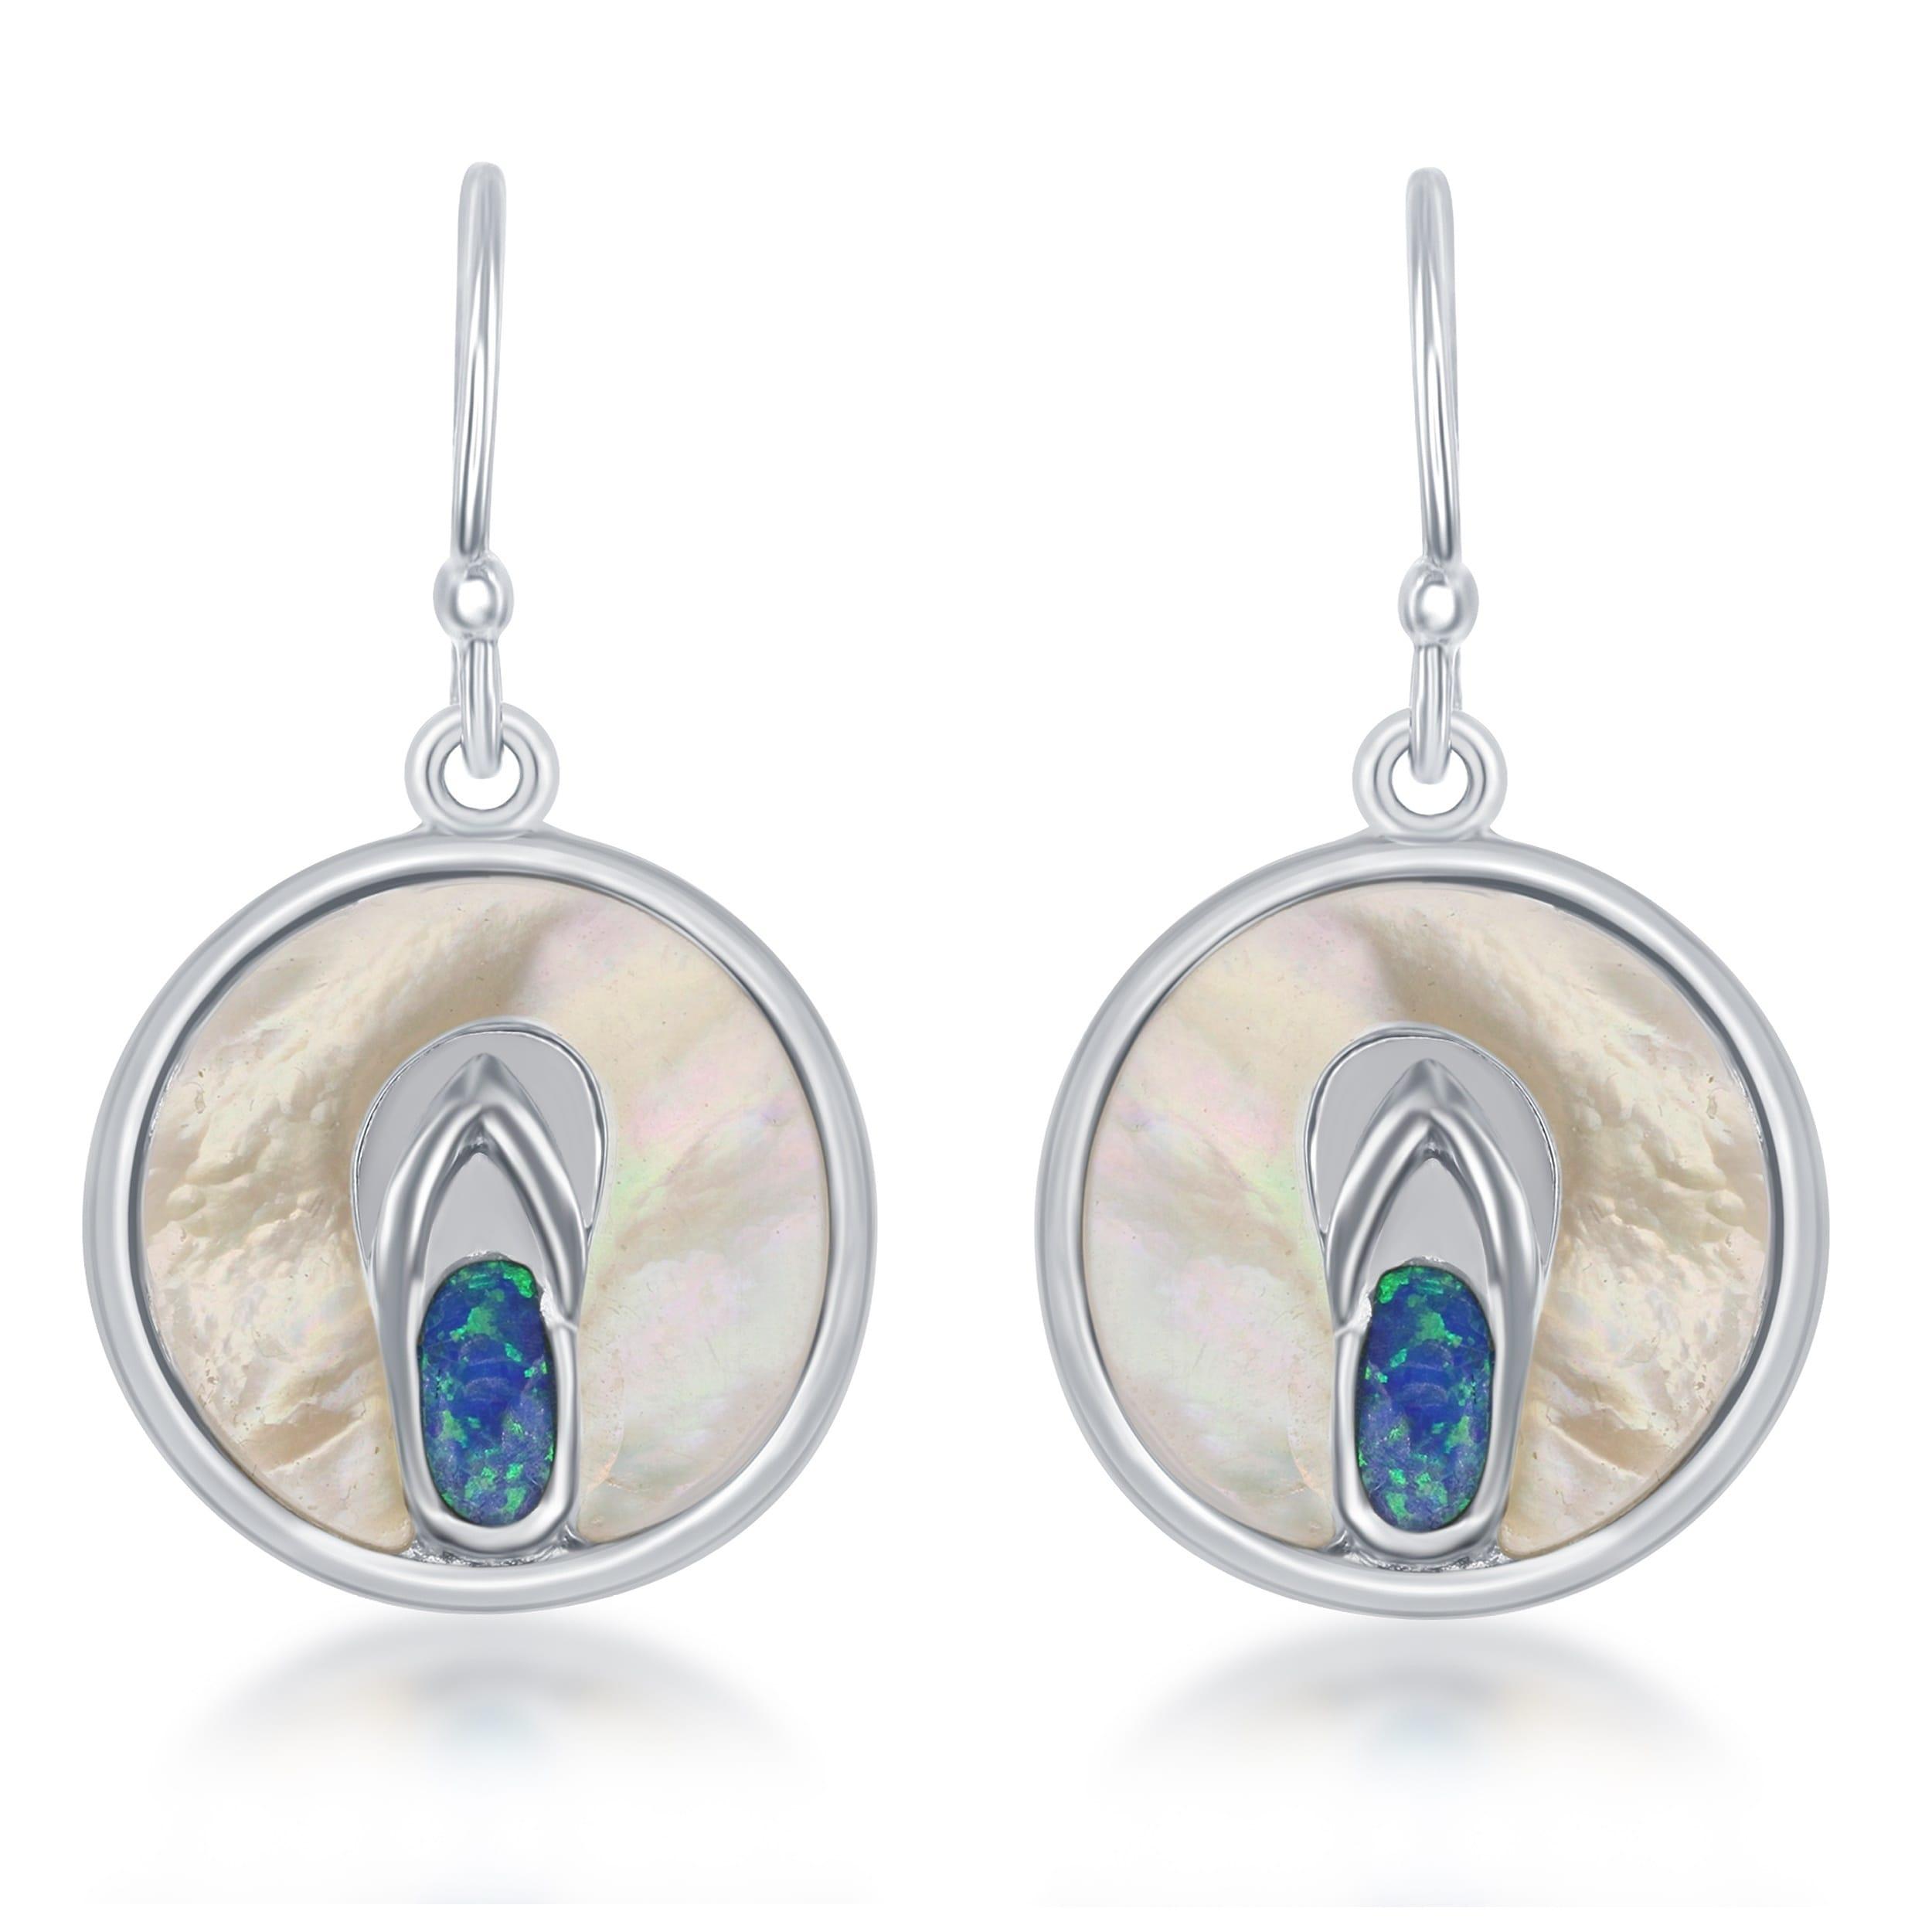 silver hoops Mother of pearl and opal earrings Opal silver Earrings hoop round earrings Pearl floral sterling silver floral earrings